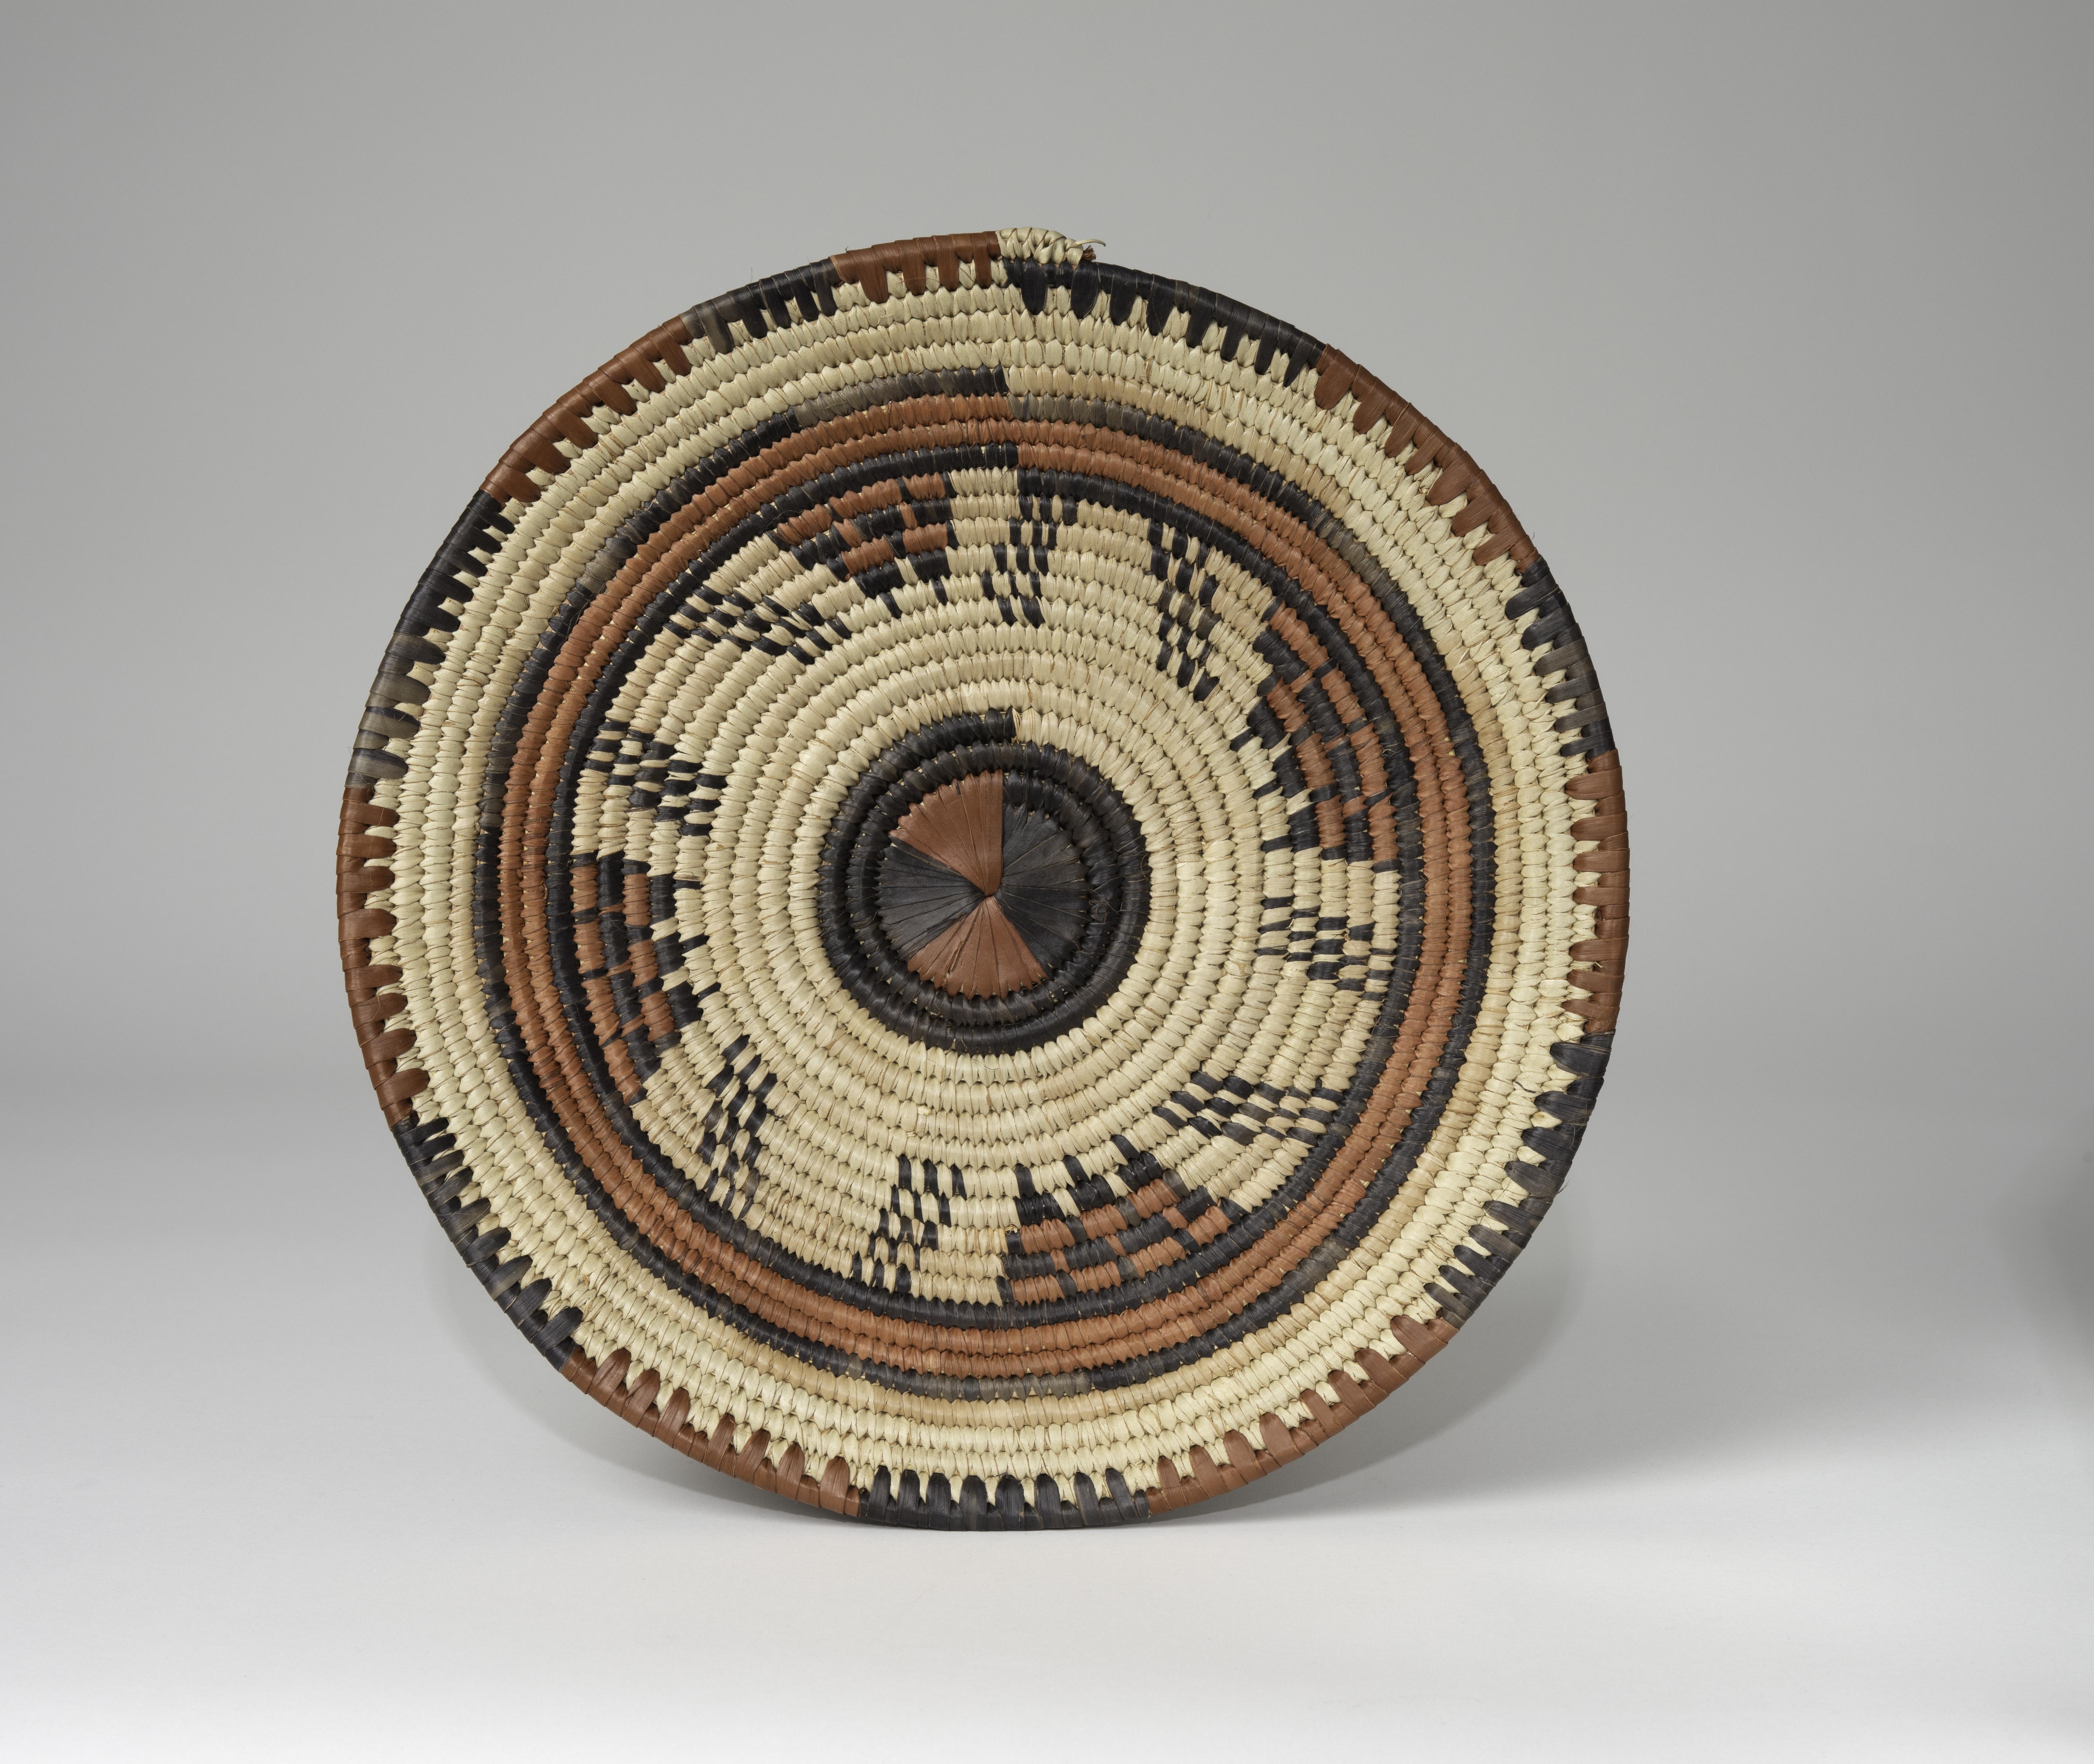 Coiled plaque, Hausa Tribe, Nigeria, ca. 1970